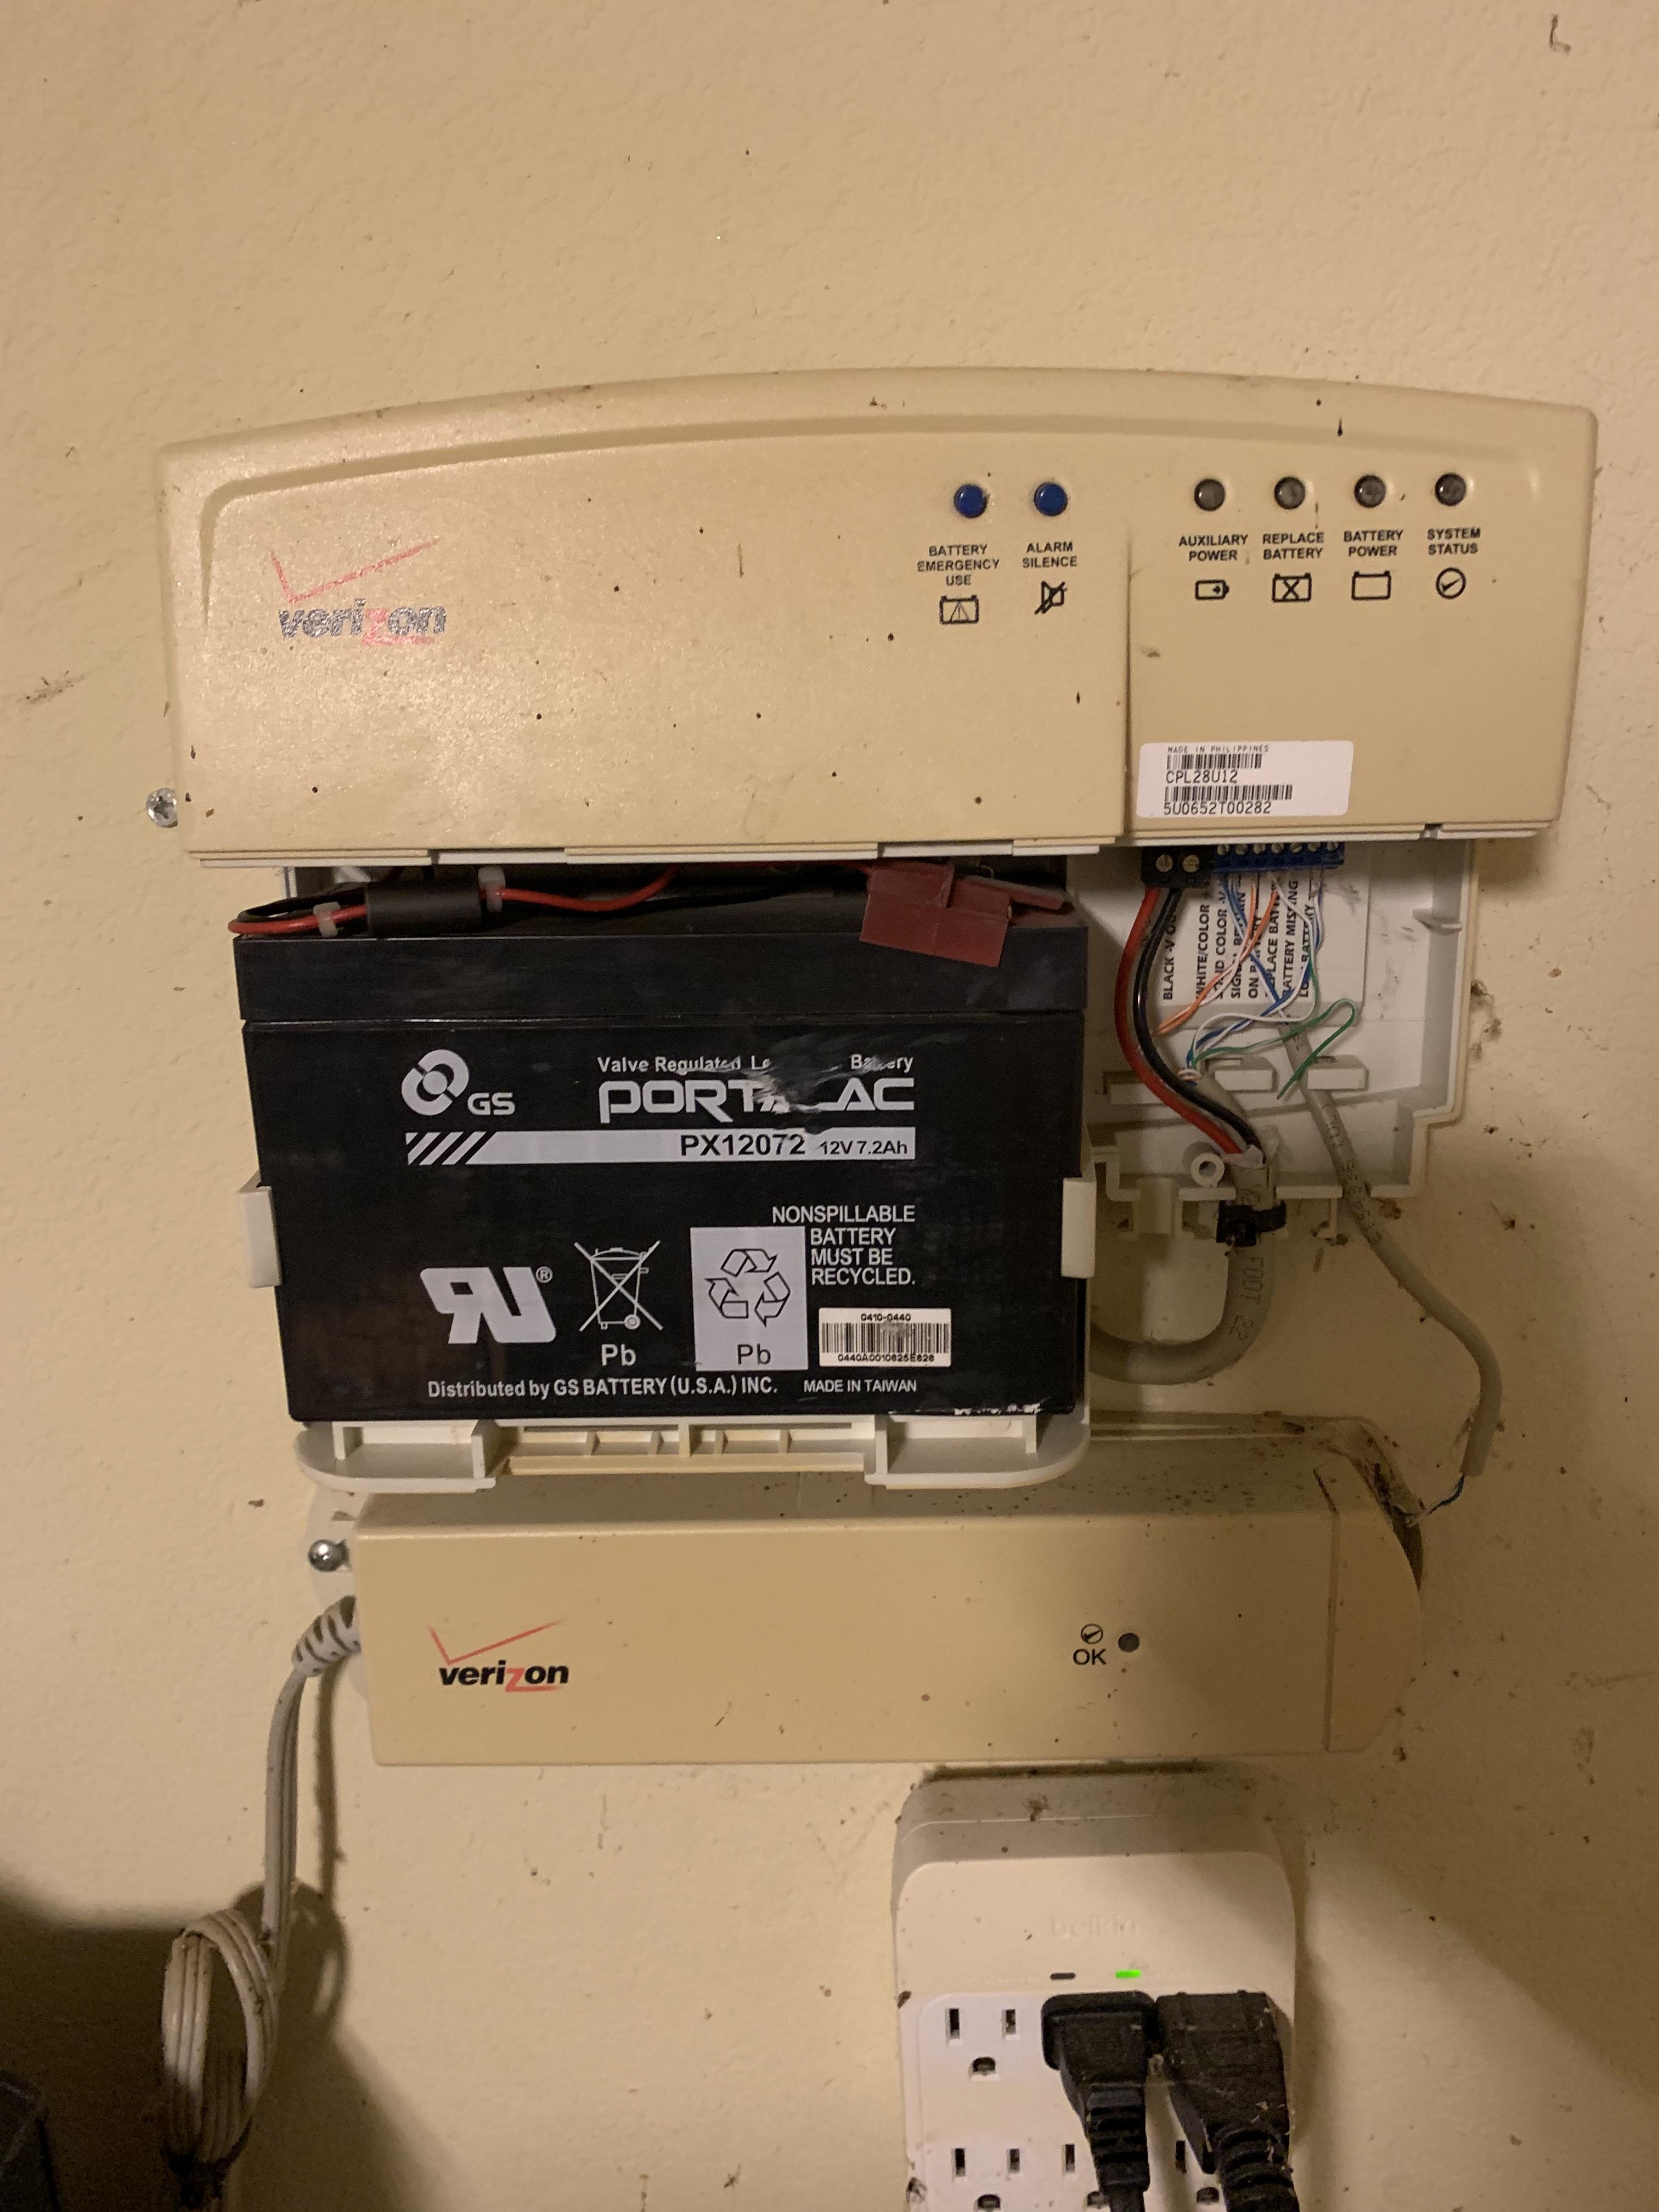 verizon router ethernet wall jack wiring correct answer fios box in my garage  help    verizon community  correct answer fios box in my garage